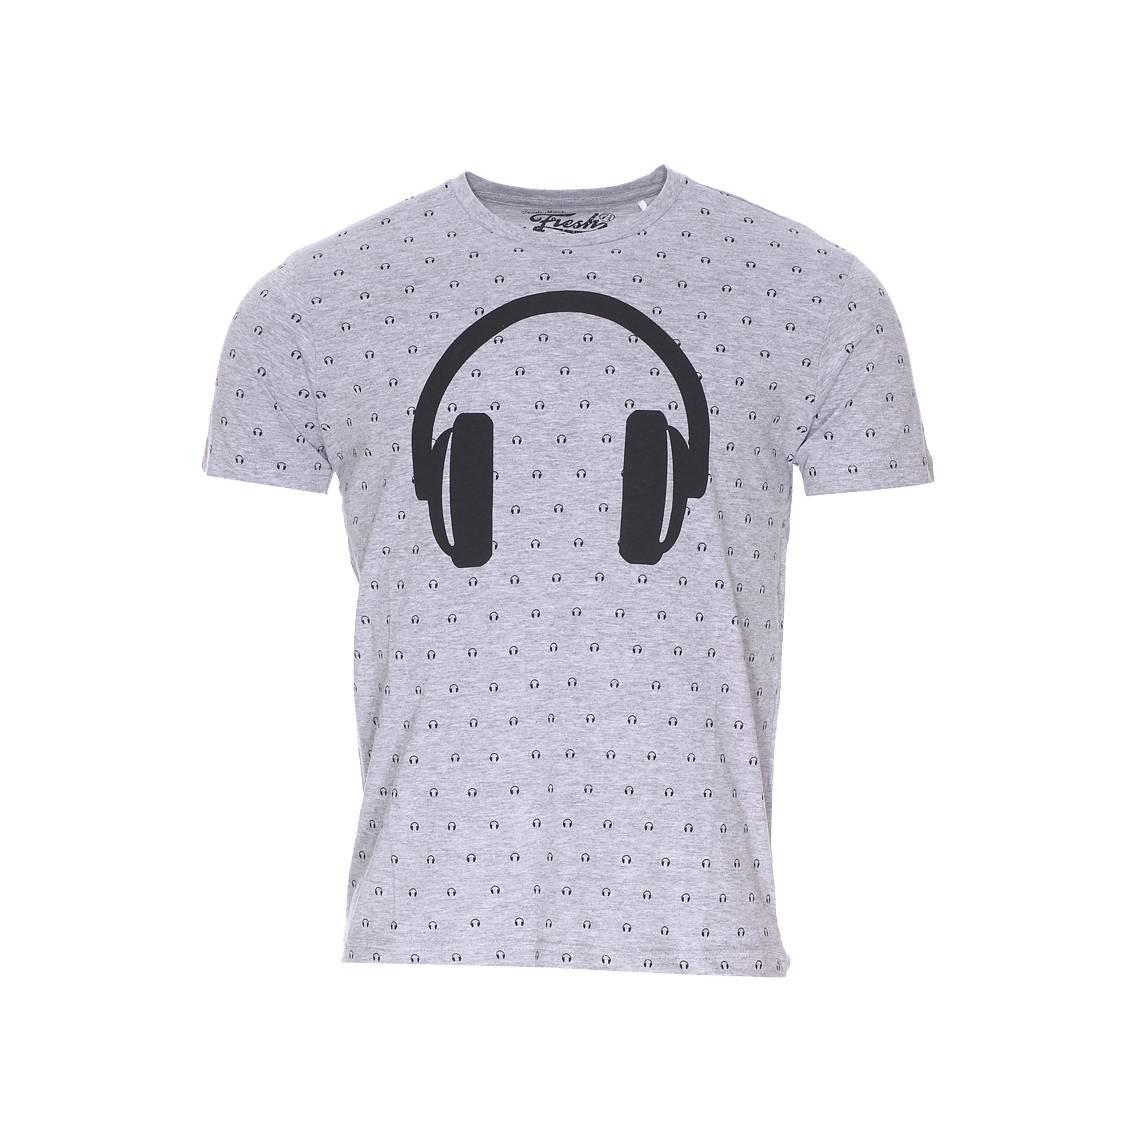 Casque jusqu 58 pureshopping for Fresh brand t shirts